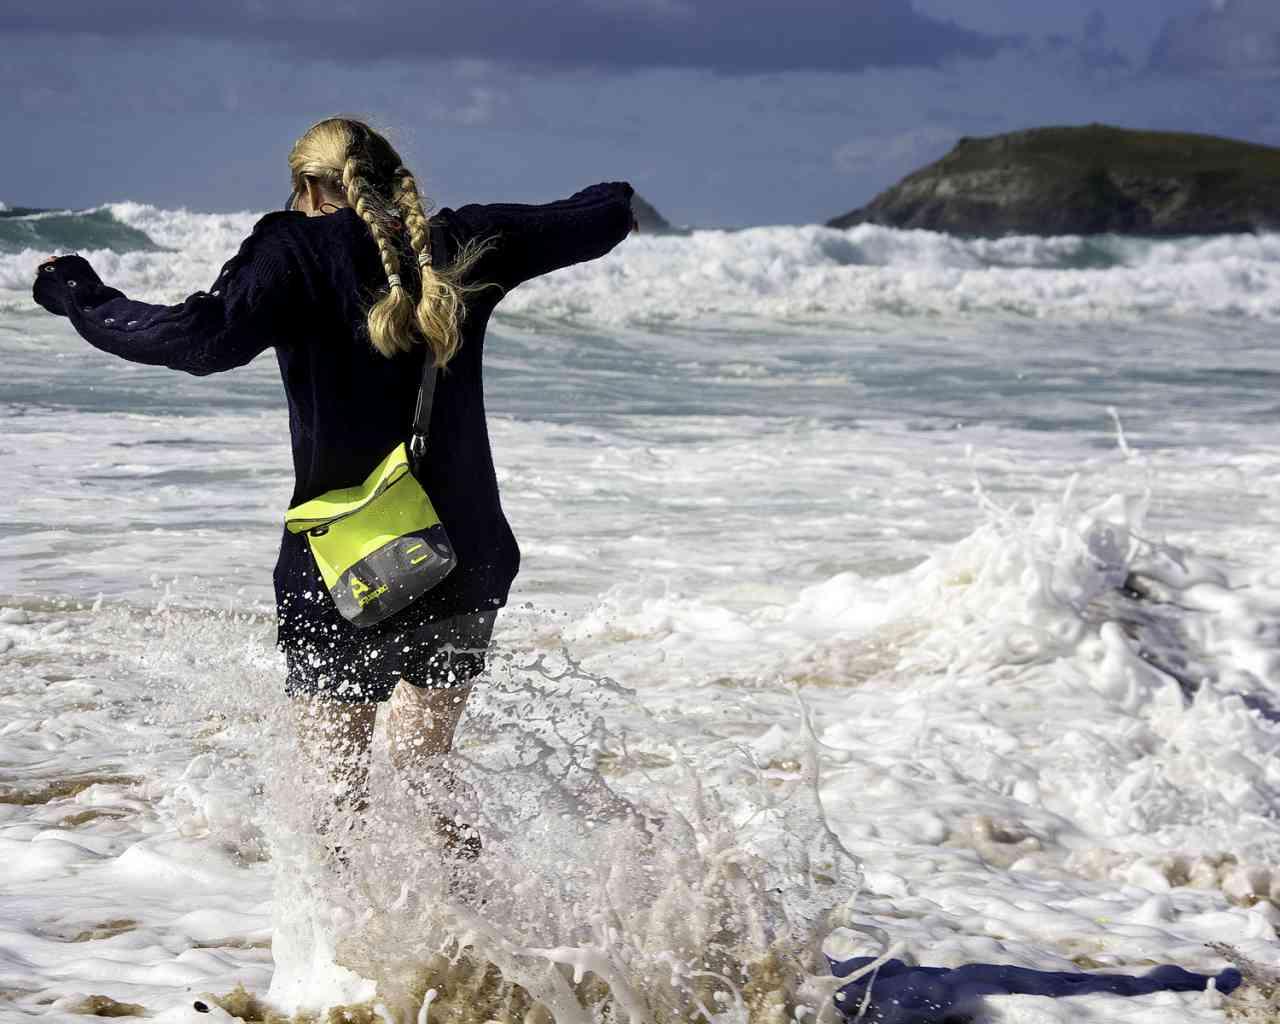 Брызгозащитная сумка Aquapac 051 - TrailProof™ Tote Bag – Small.. Aquapac - №1 в мире водонепроницаемых чехлов и сумок. Фото 6